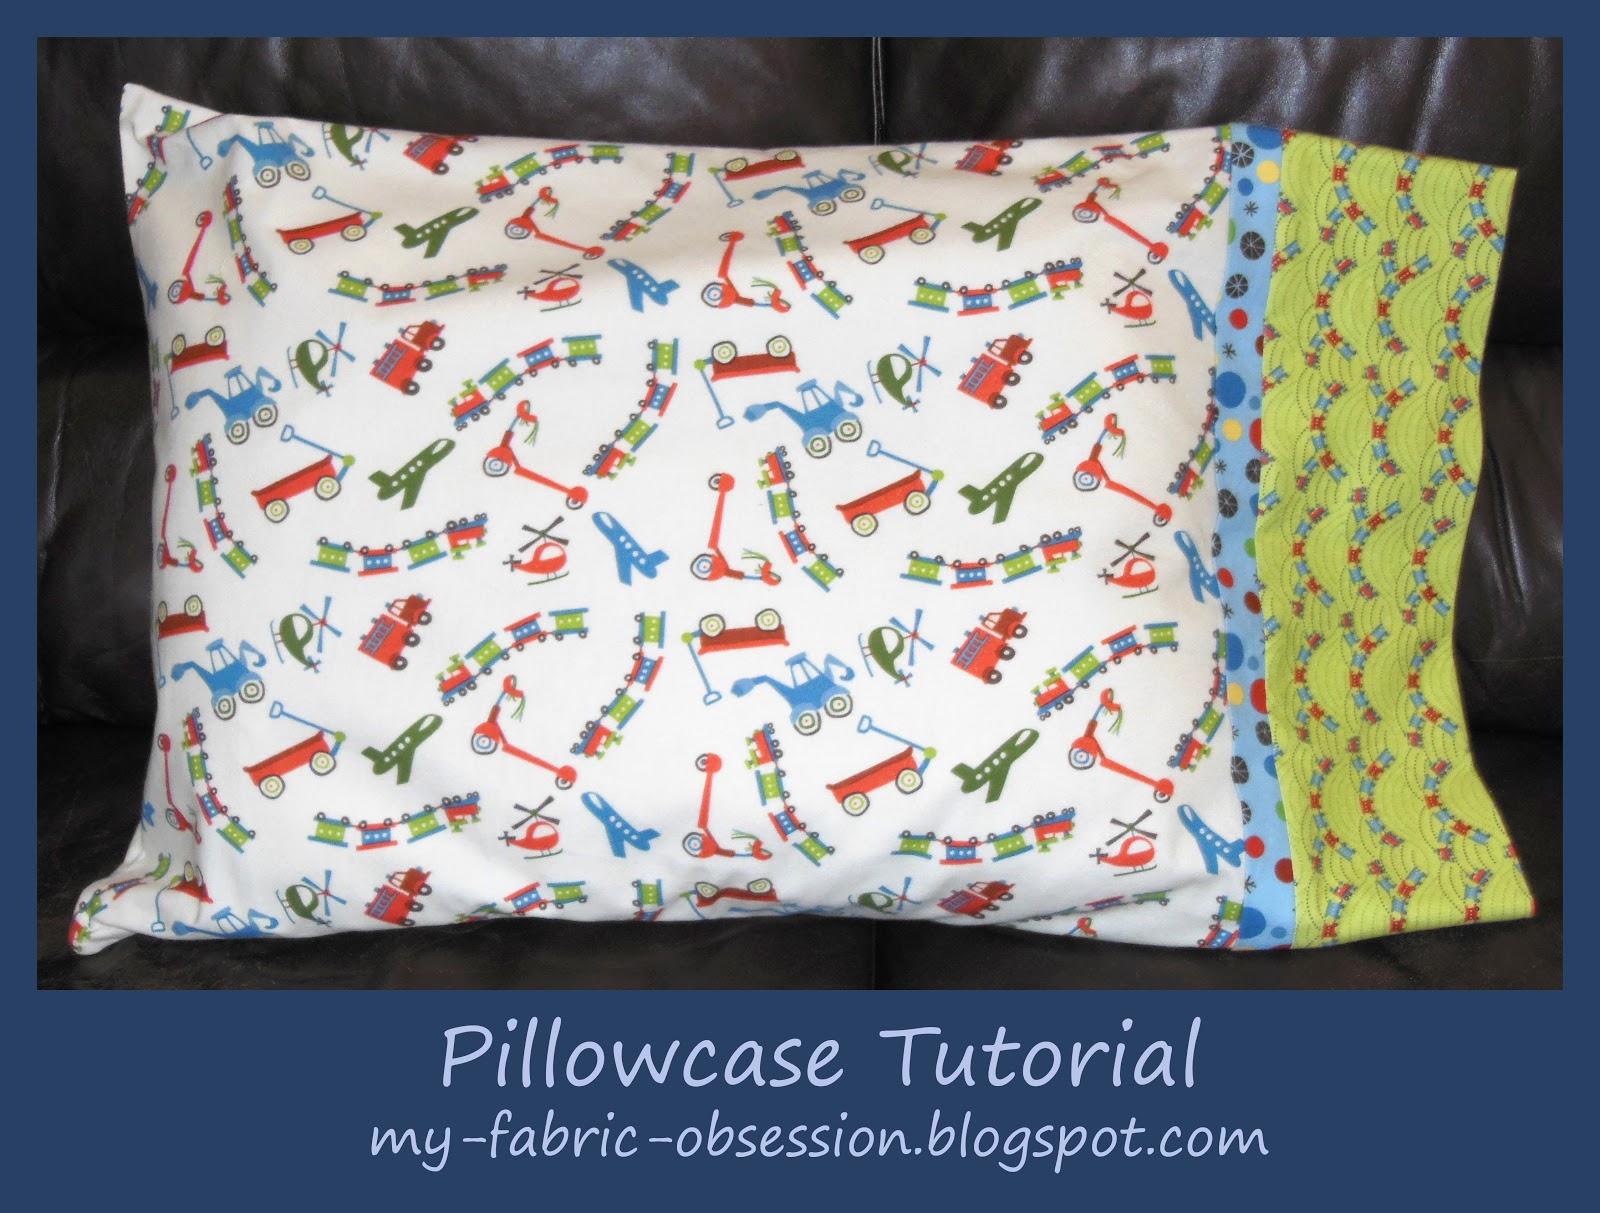 PROJECT IDEA: SUPER QUICK TUBE PILLOW CASE | Janome Life & Magic Pillow Case - Lessons - Tes Teach pillowsntoast.com